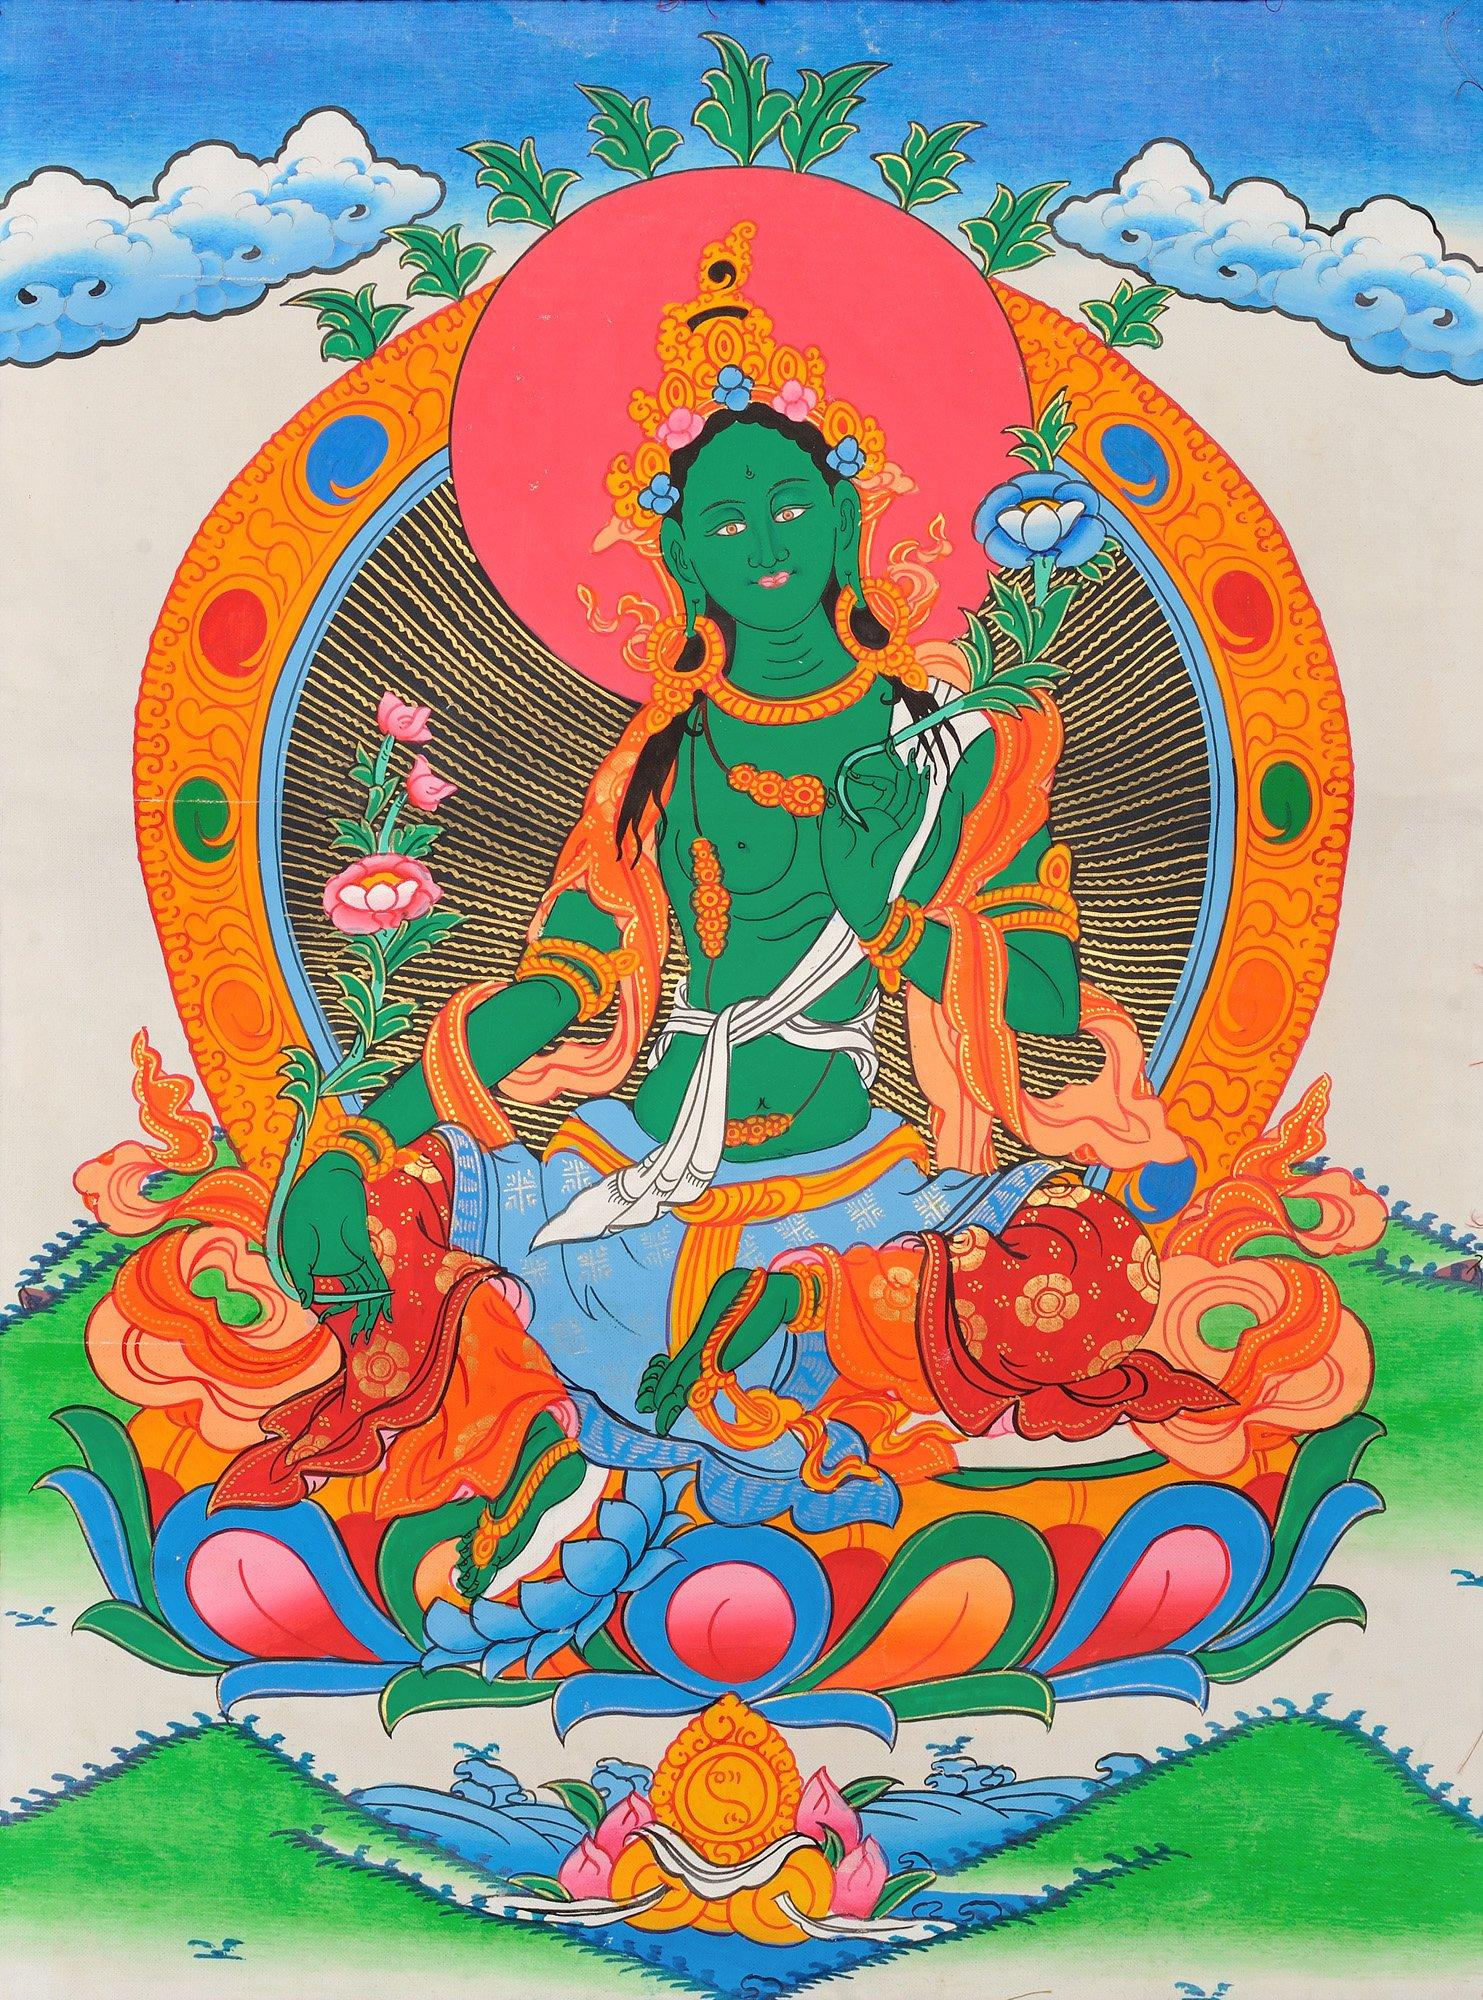 Green Tara 3: The Beautiful Tibetan Buddhist Goddess